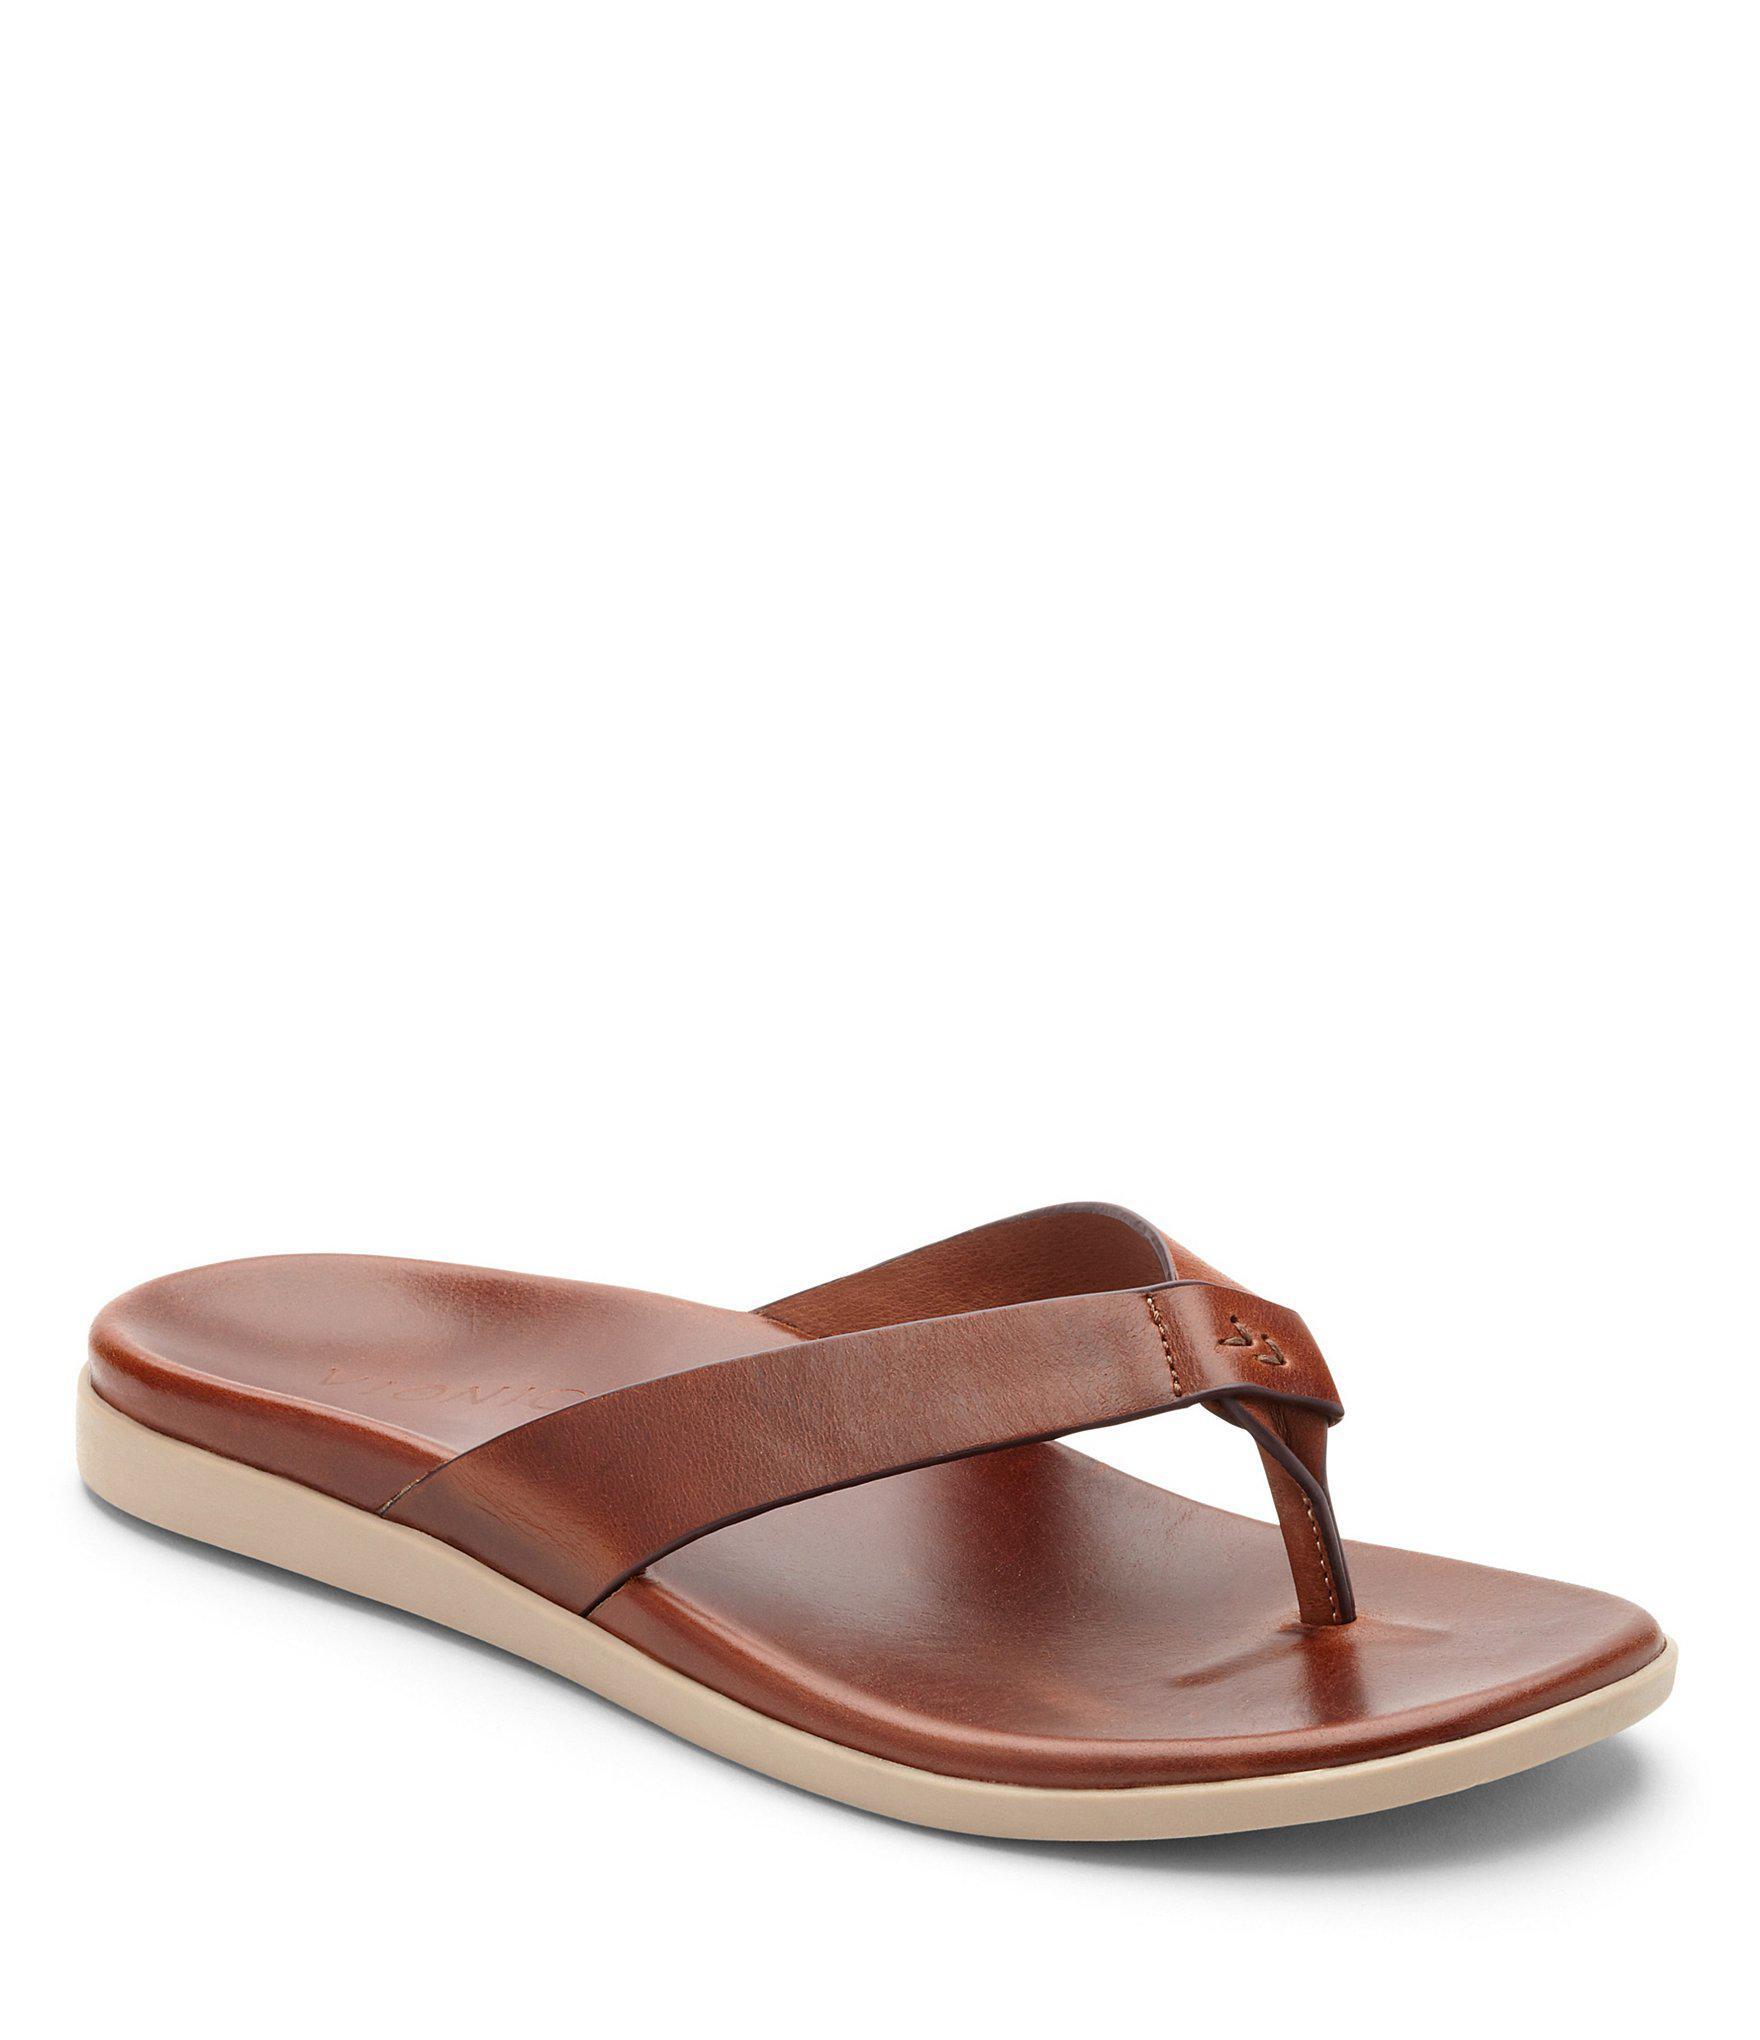 27ae9273a4c9 Lyst - Vionic Men s Elijah Flip-flops in Brown for Men